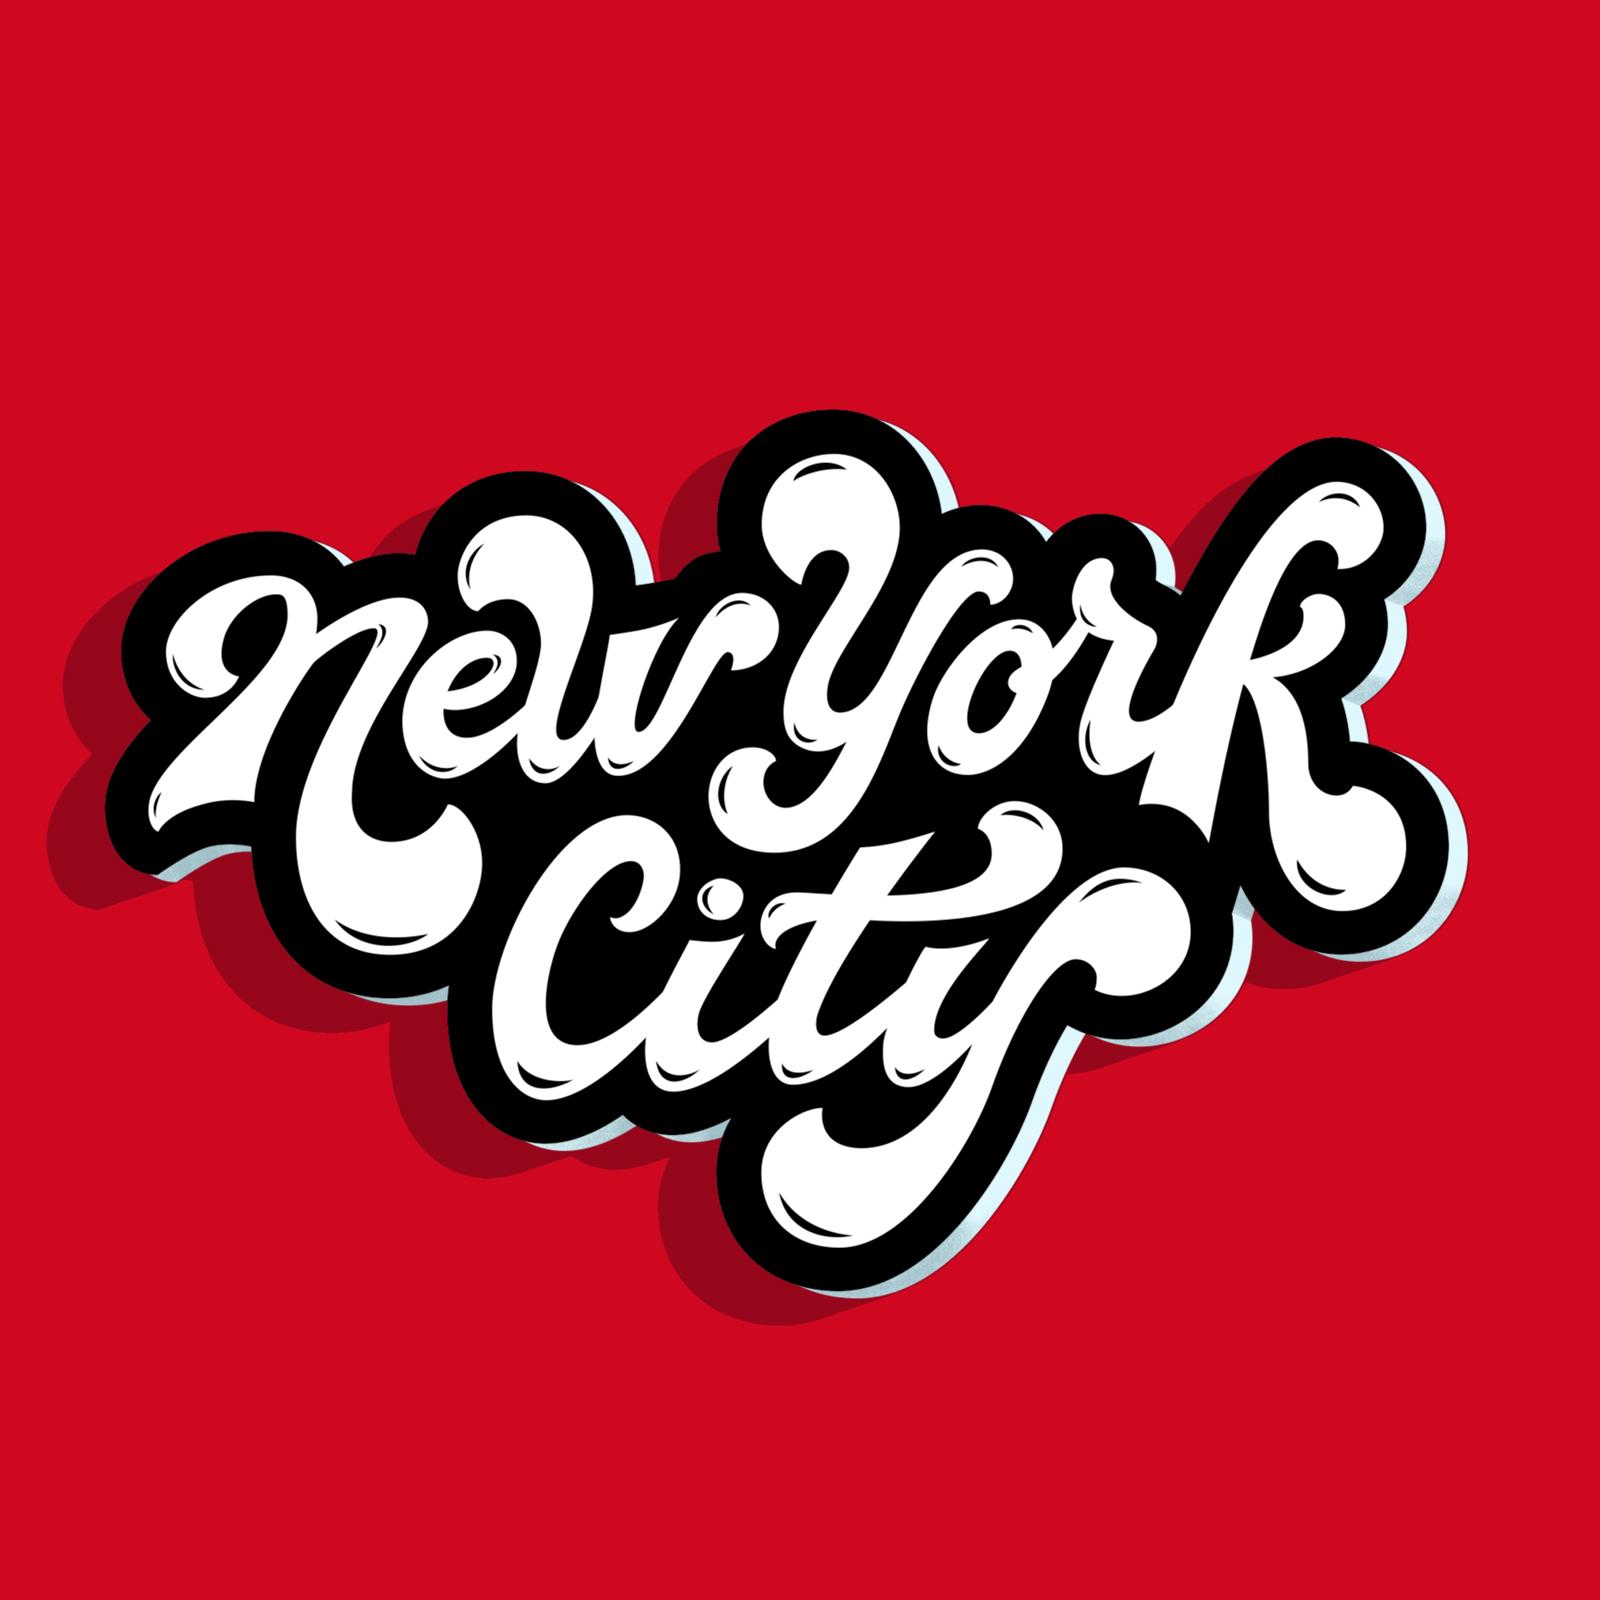 Type&Doodle - New York City